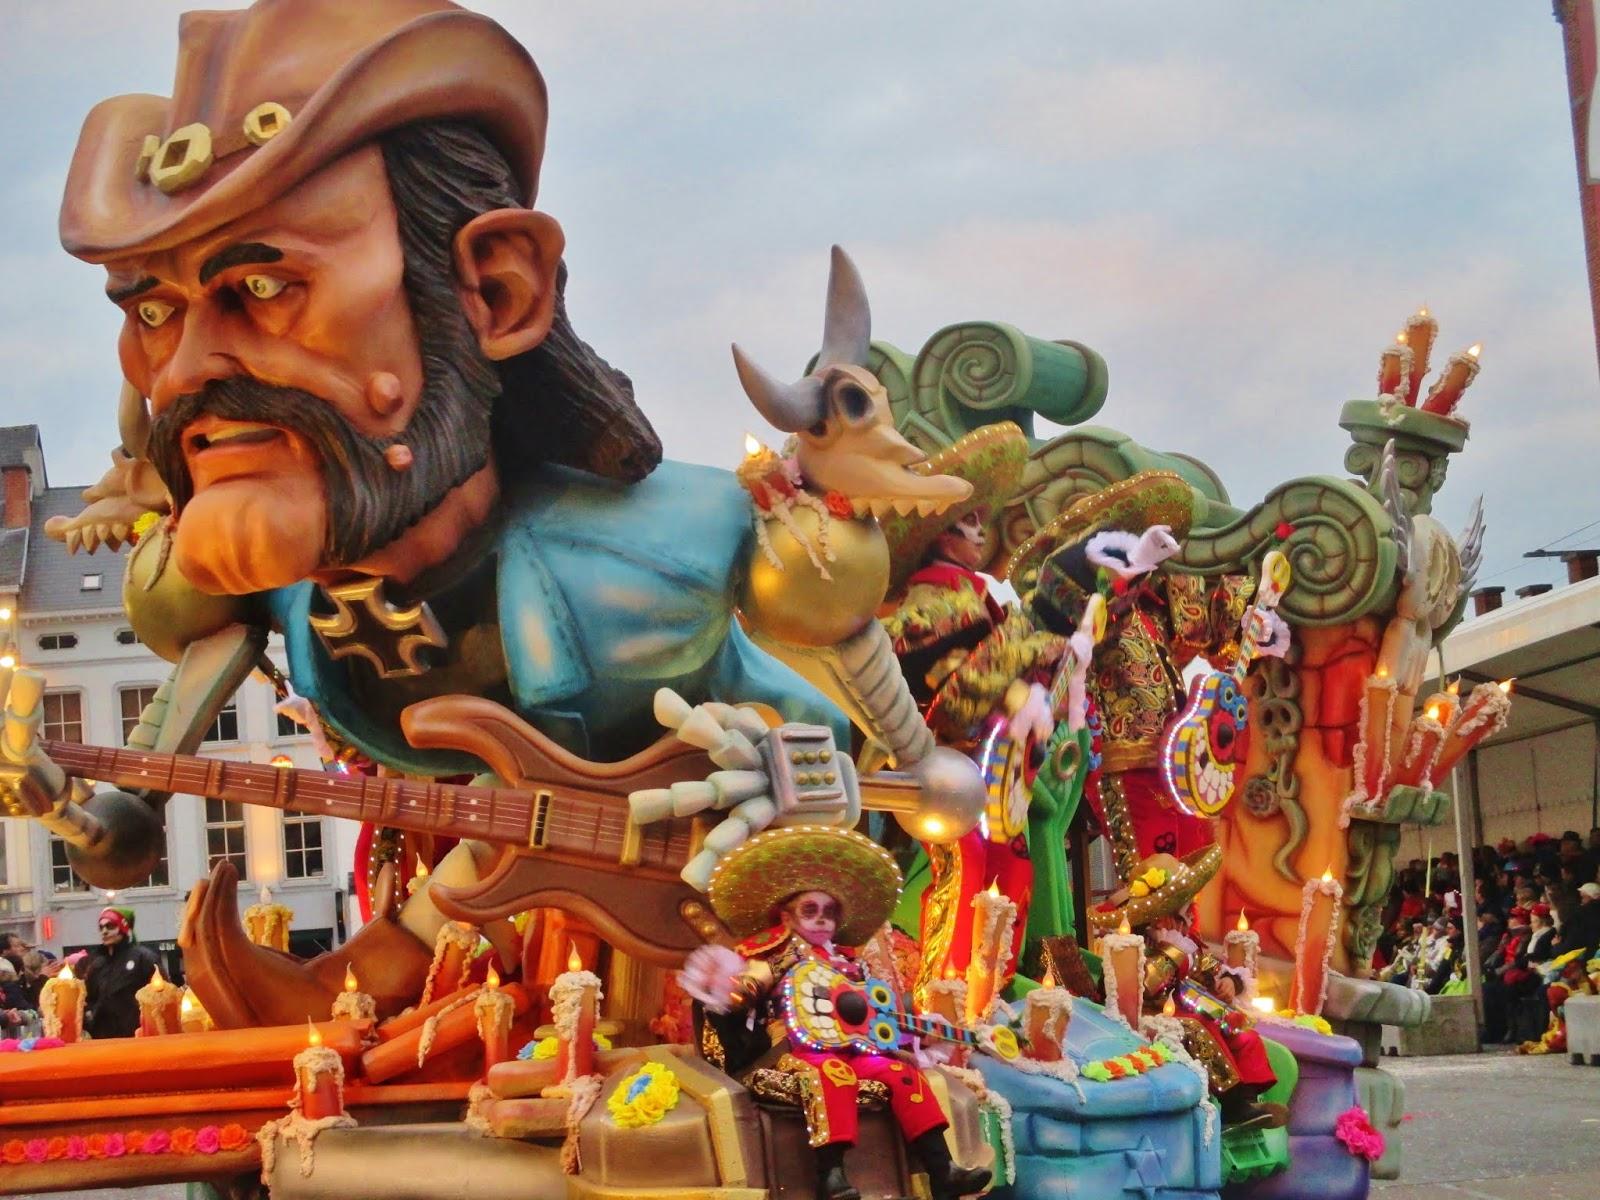 Carnaval aalst foto en videoblog: aalst carnaval 2019 stoetthema